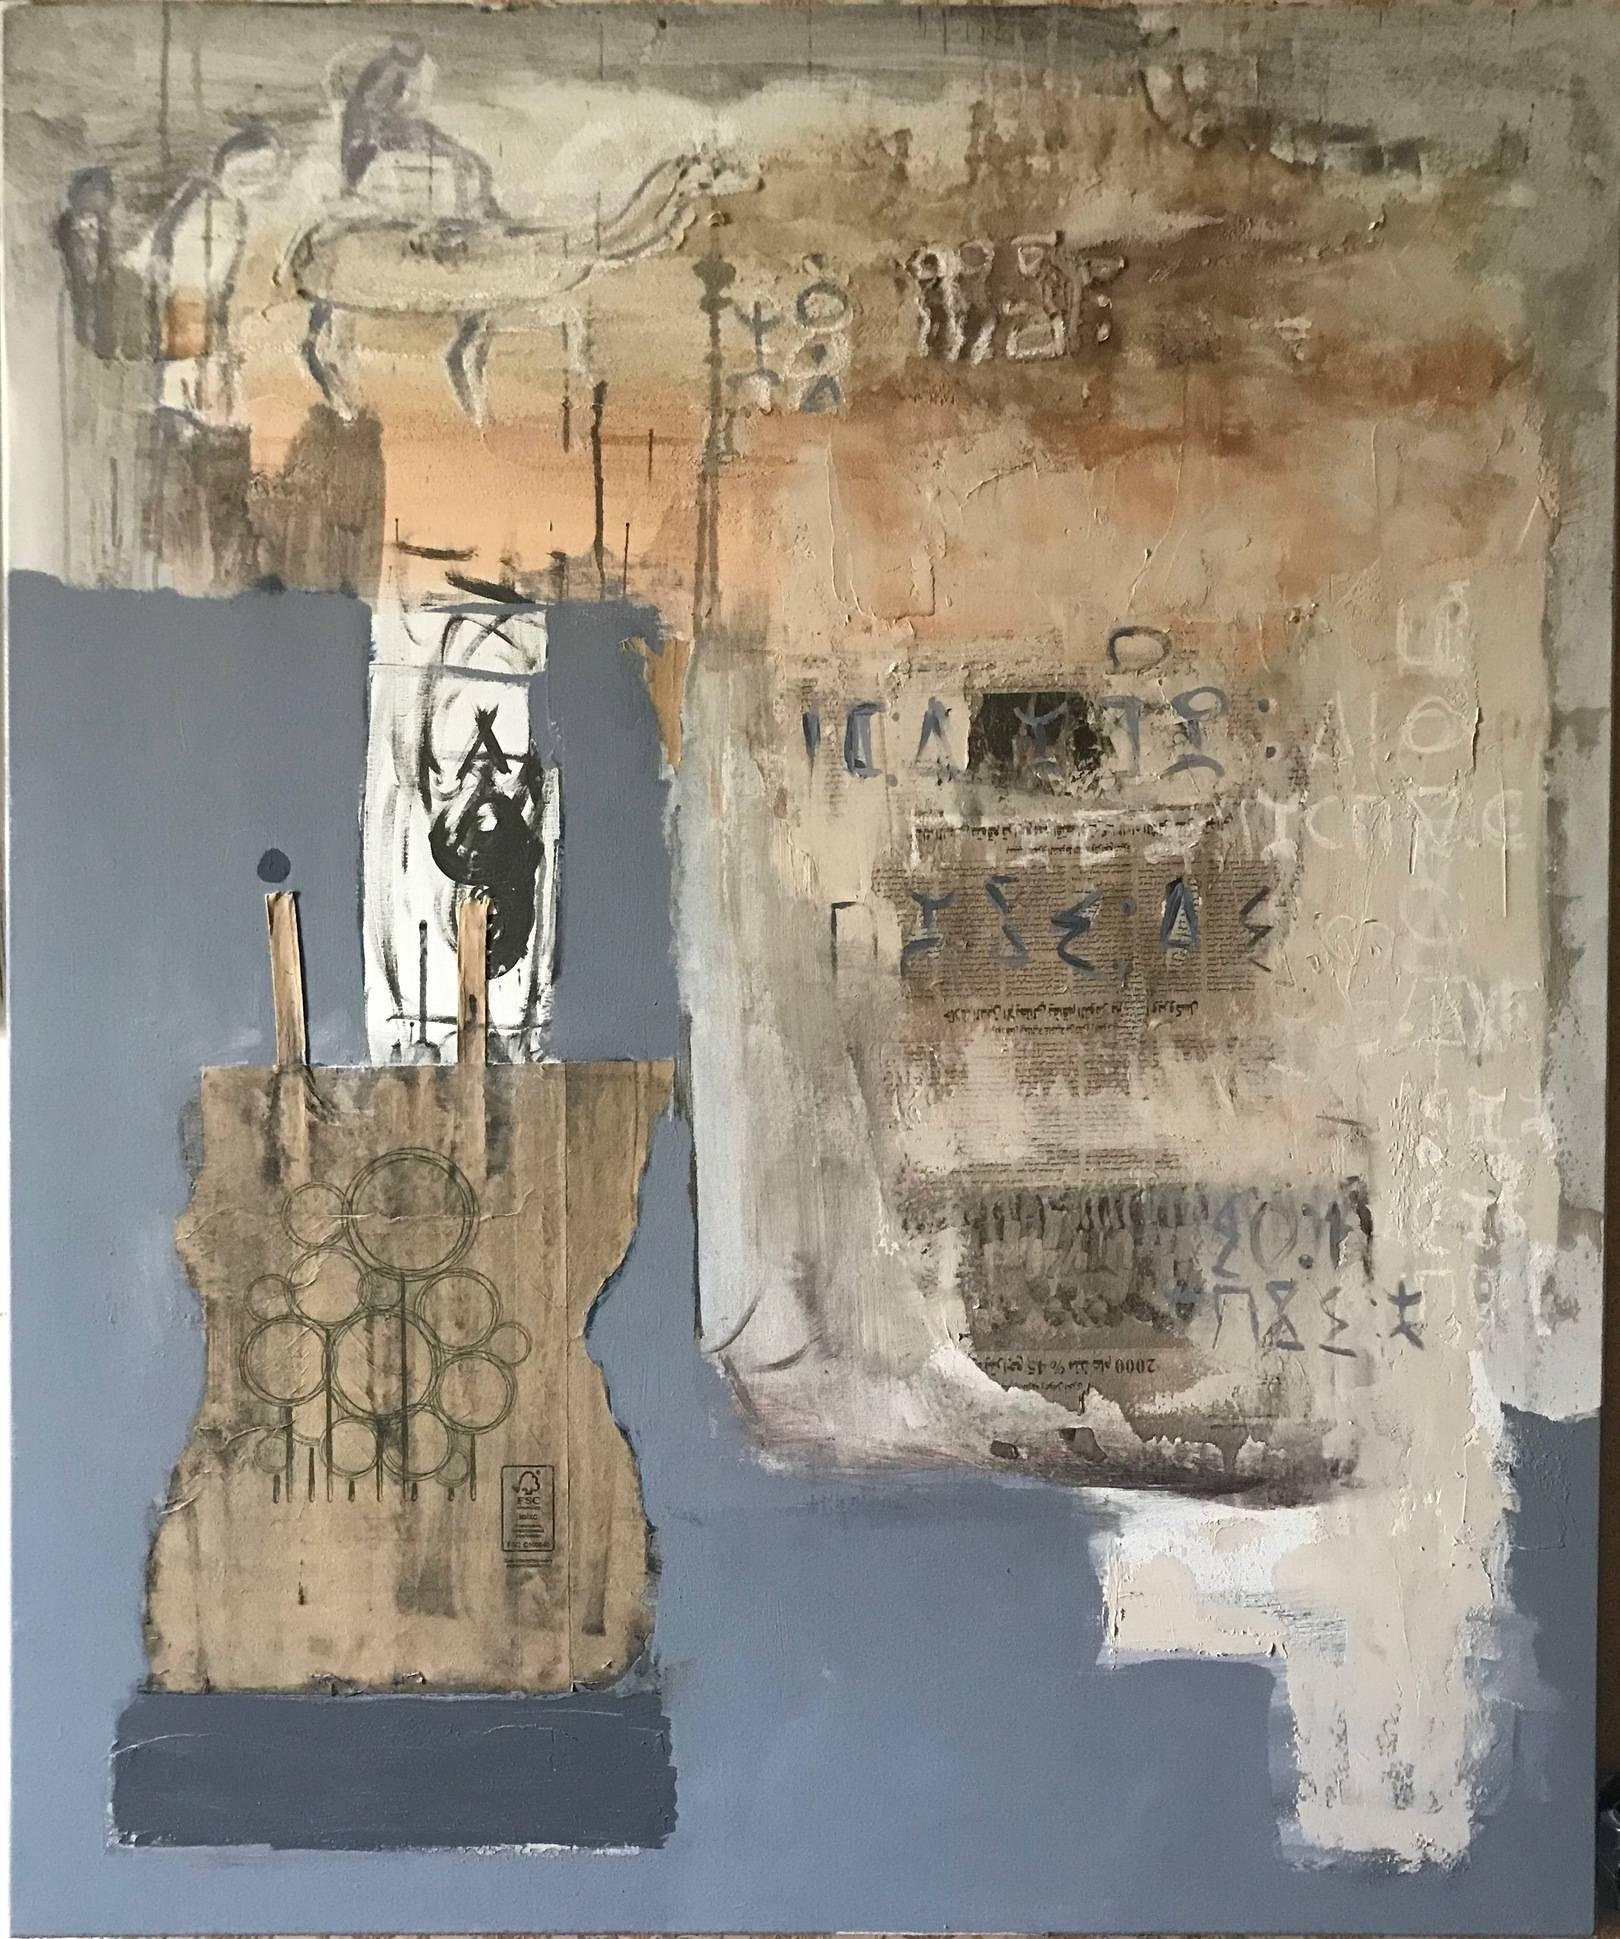 Magreb 2019 canvas 120X100 mixed media